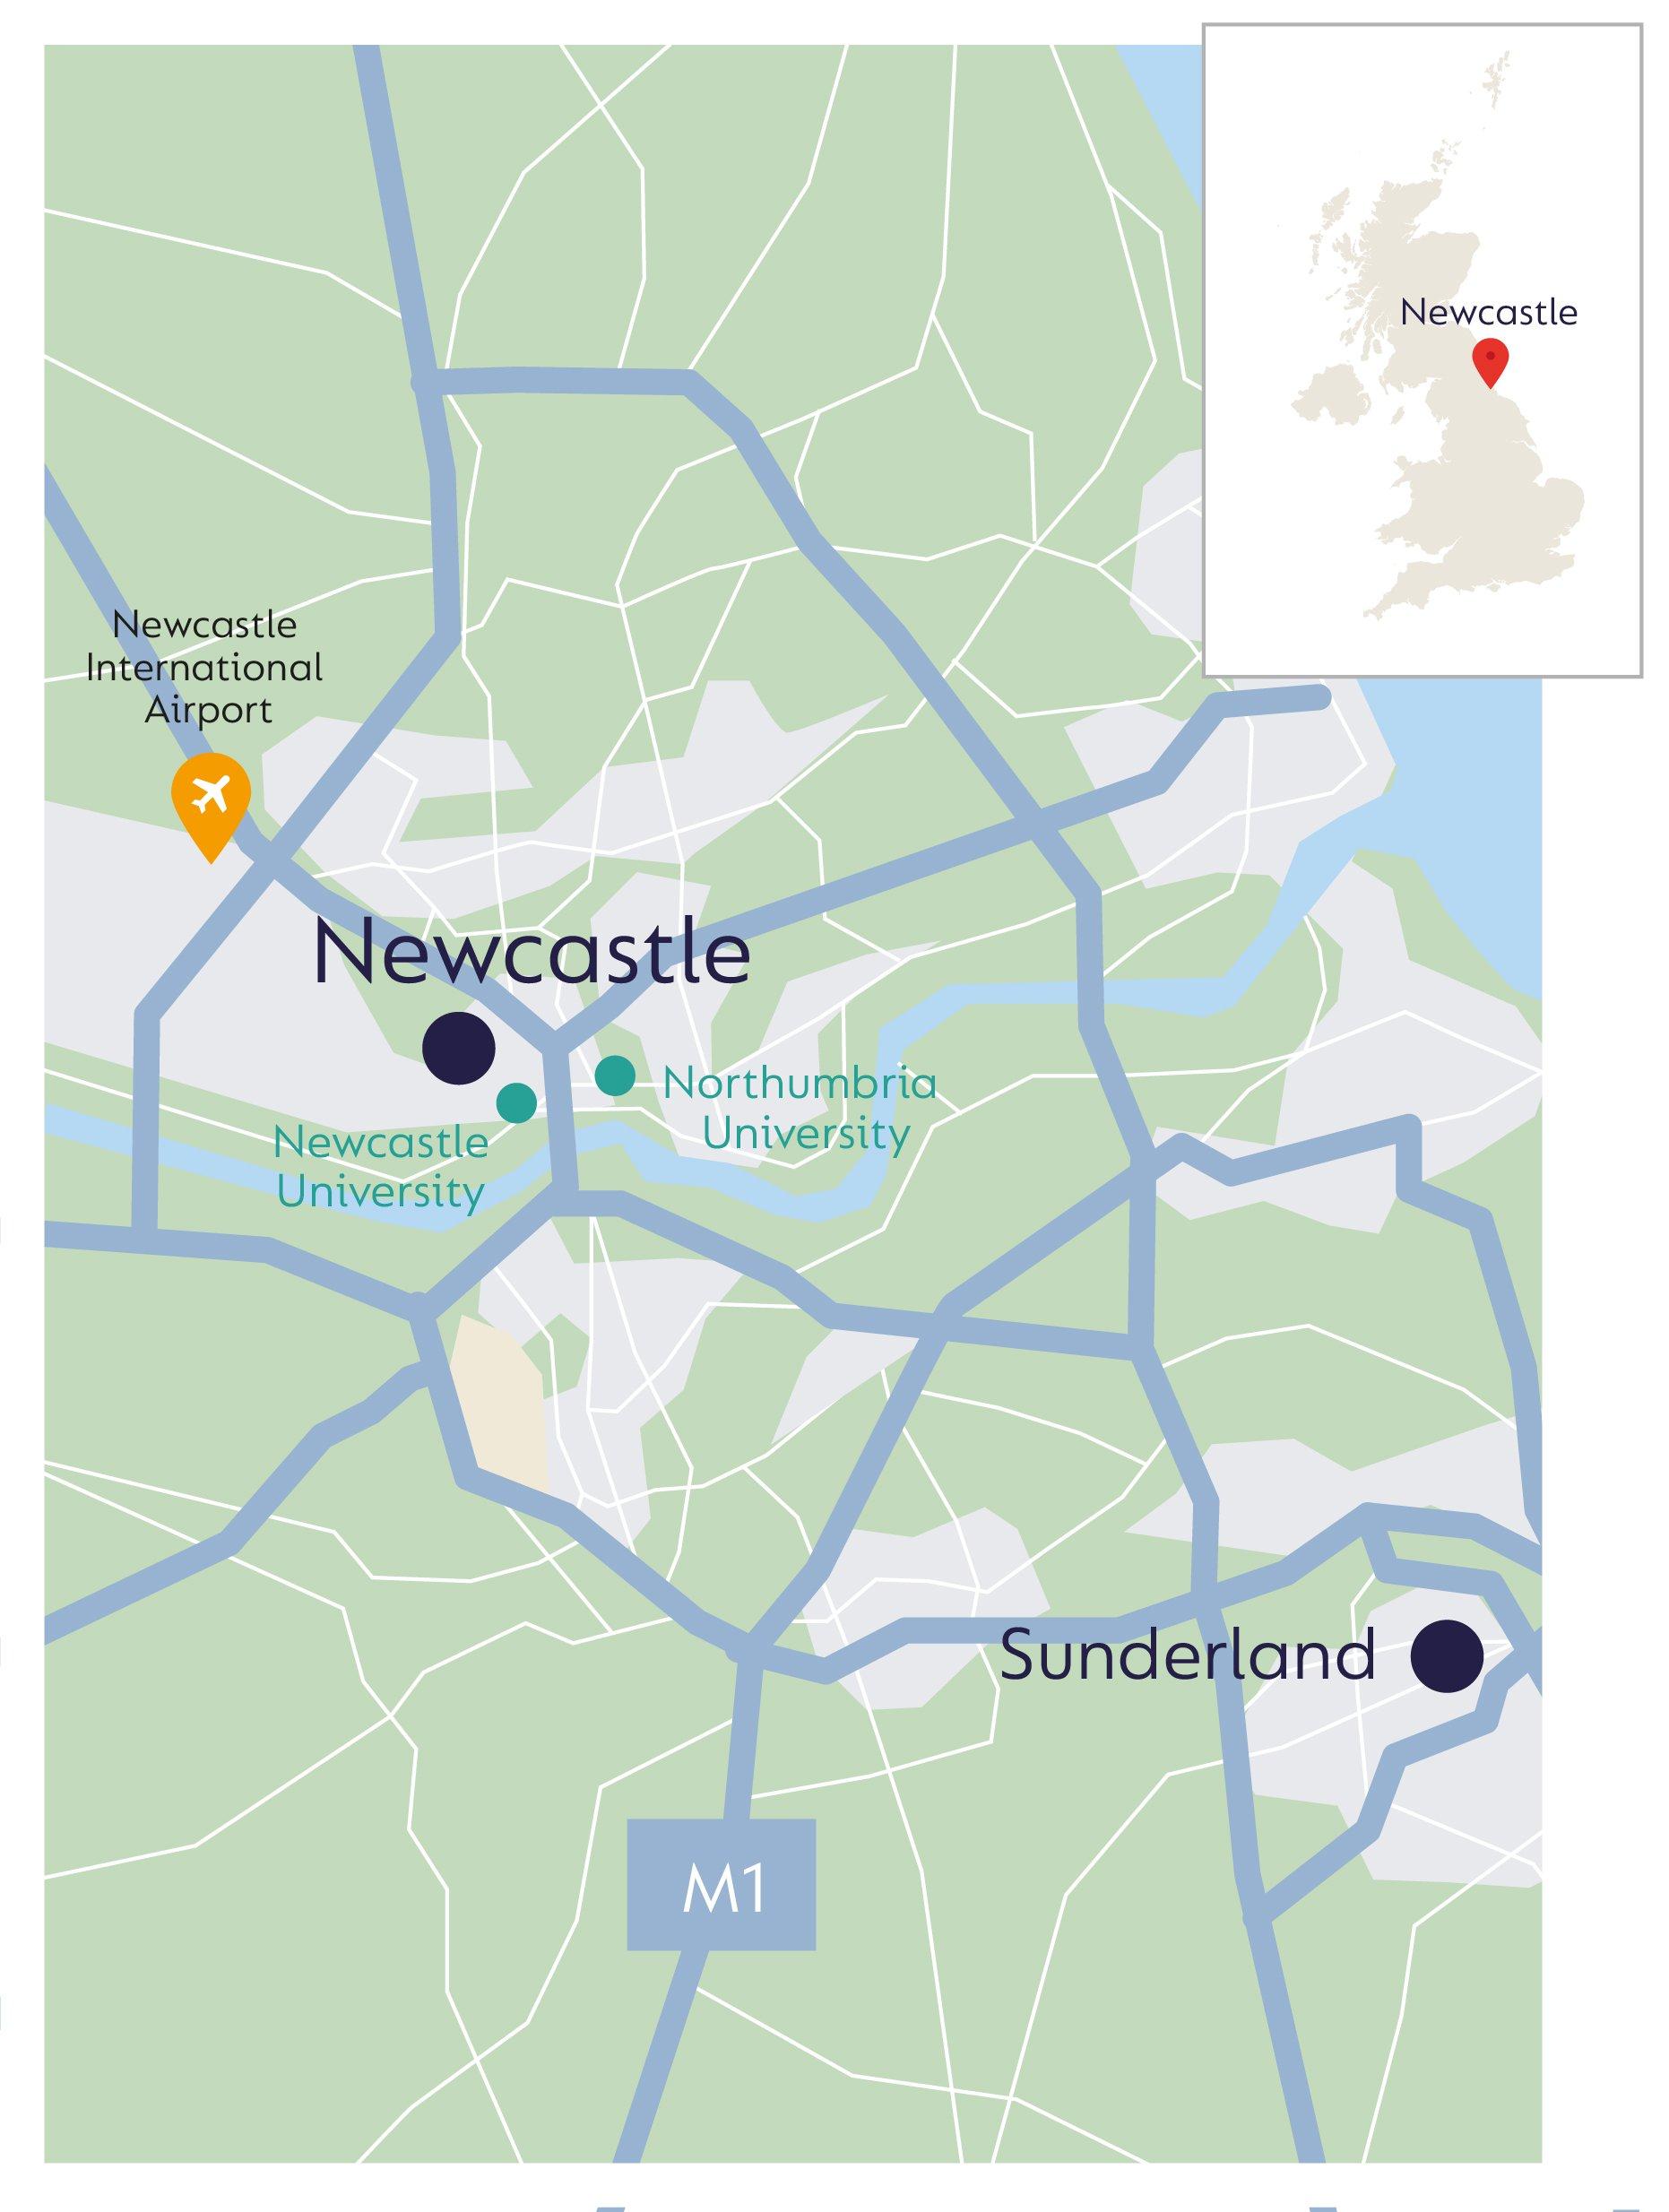 05_Immersive_Tech_Newcastle.jpg